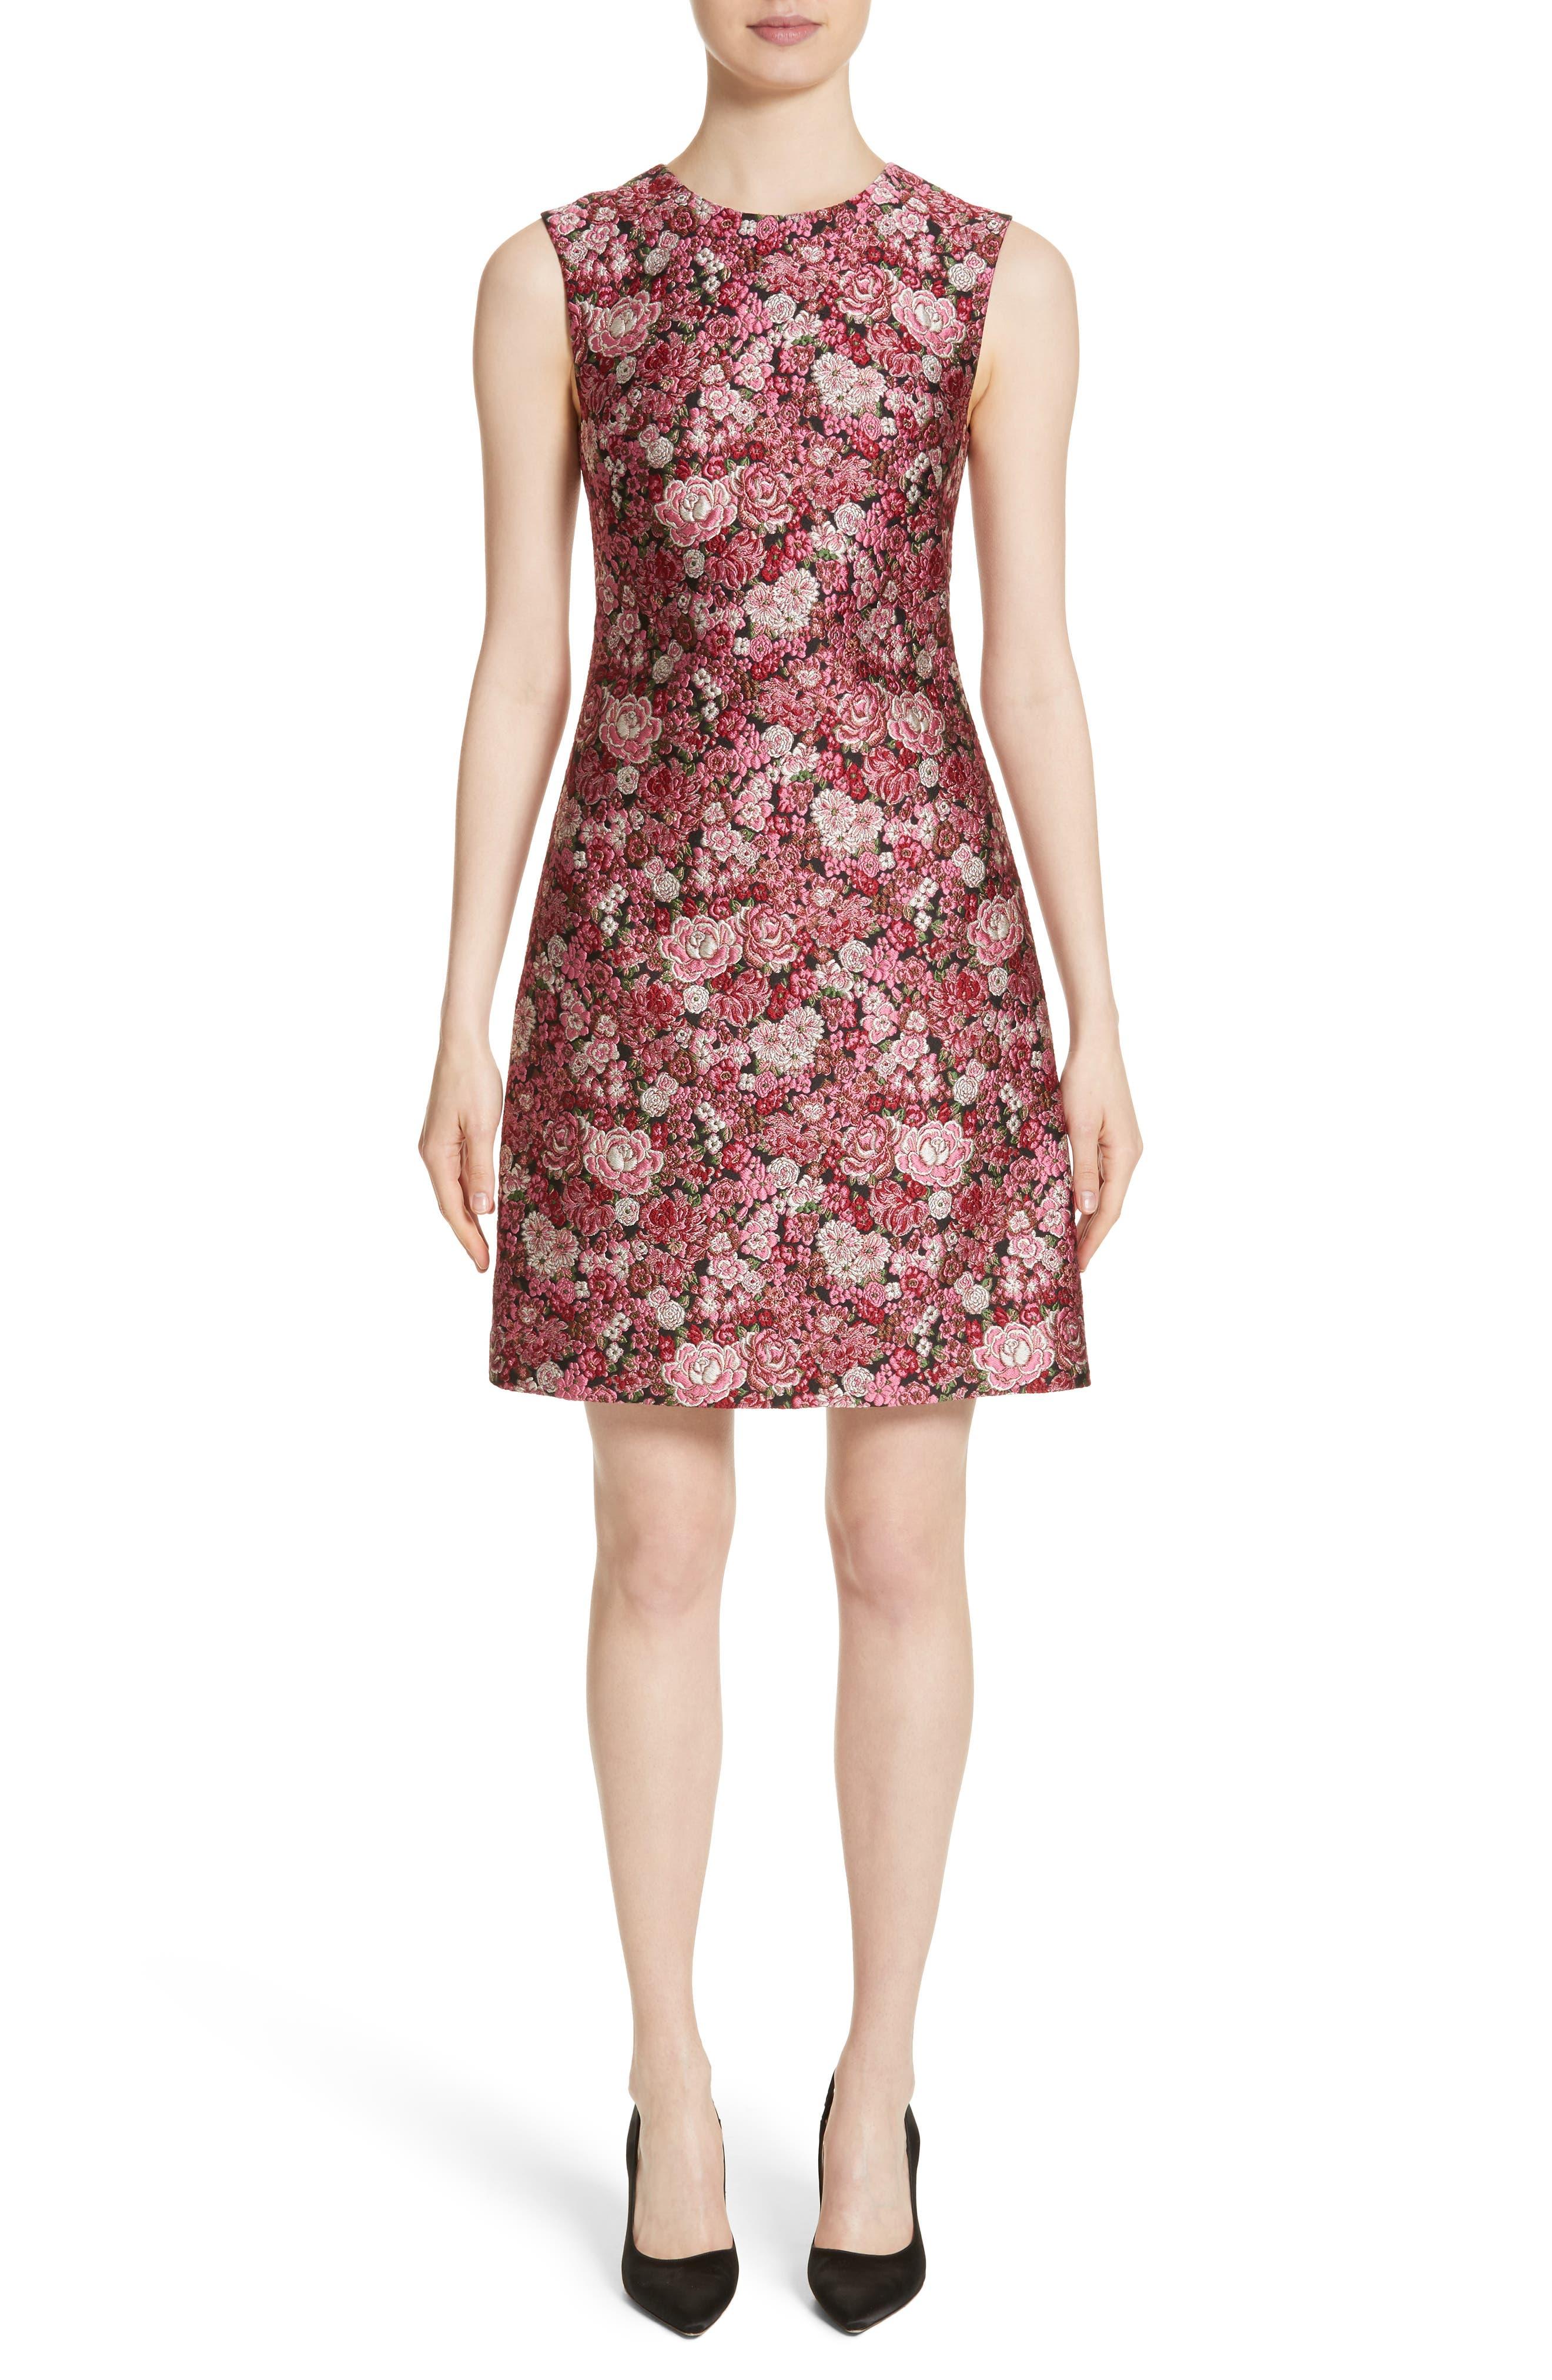 Alternate Image 1 Selected - Adam Lippes Floral Brocade Dress